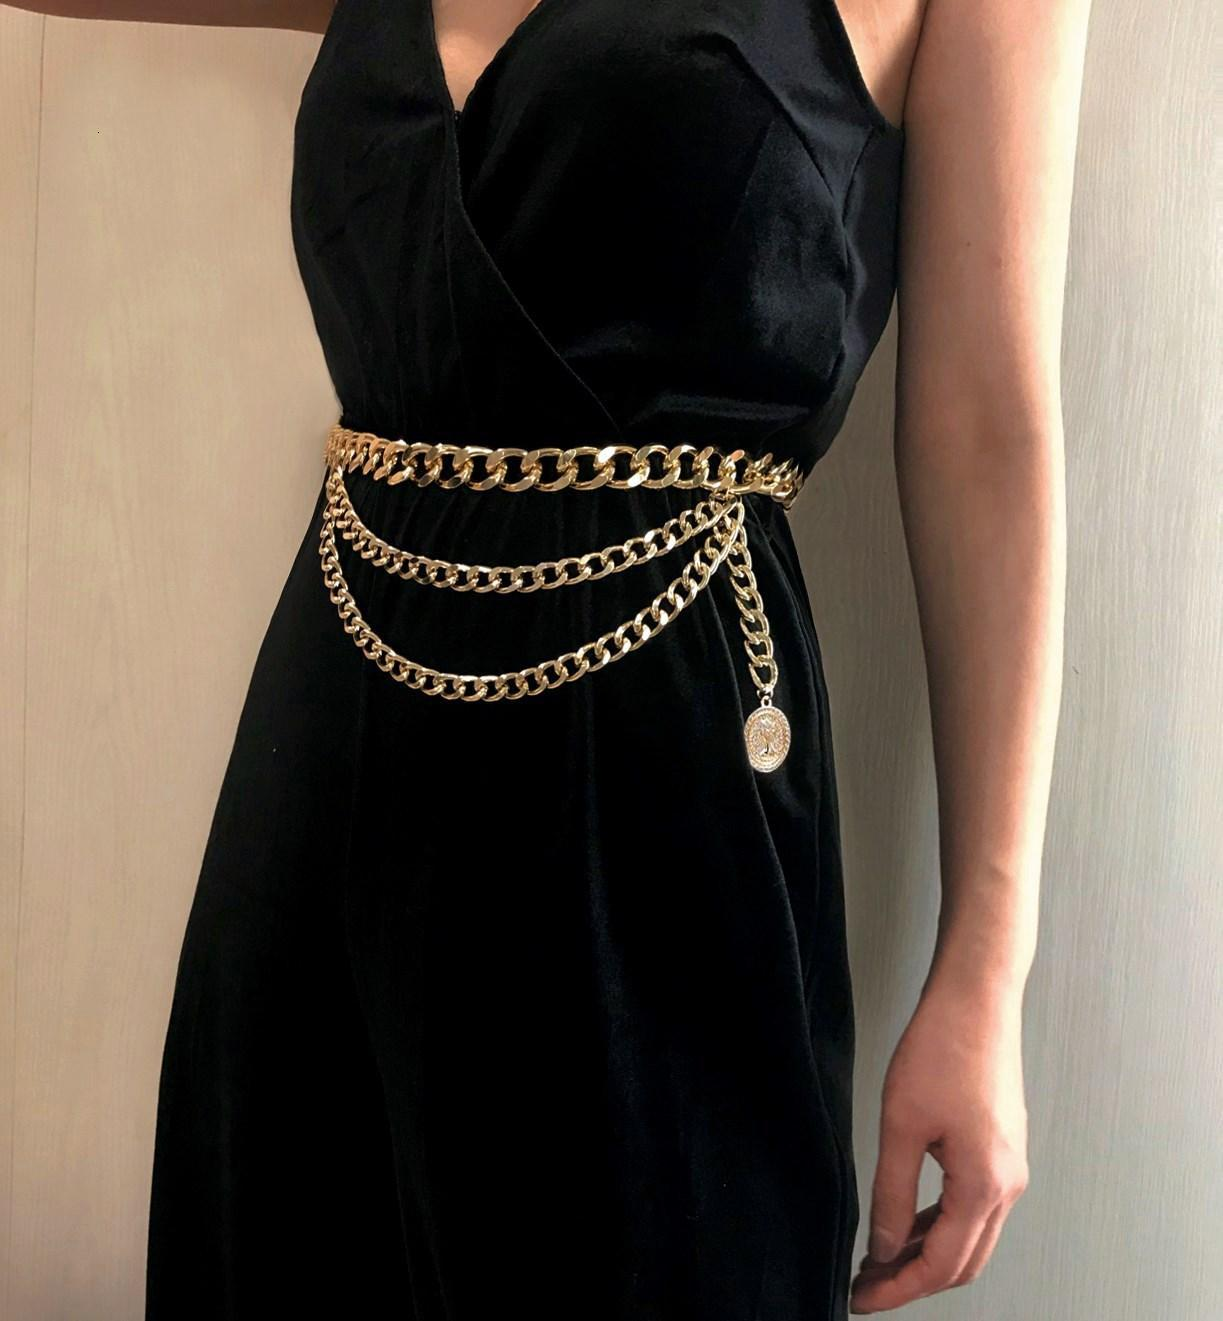 Metal Belt For Women Retro Punk Fringe Waist Silver Gold Belt Dress Ladies Tassel Chain Belts